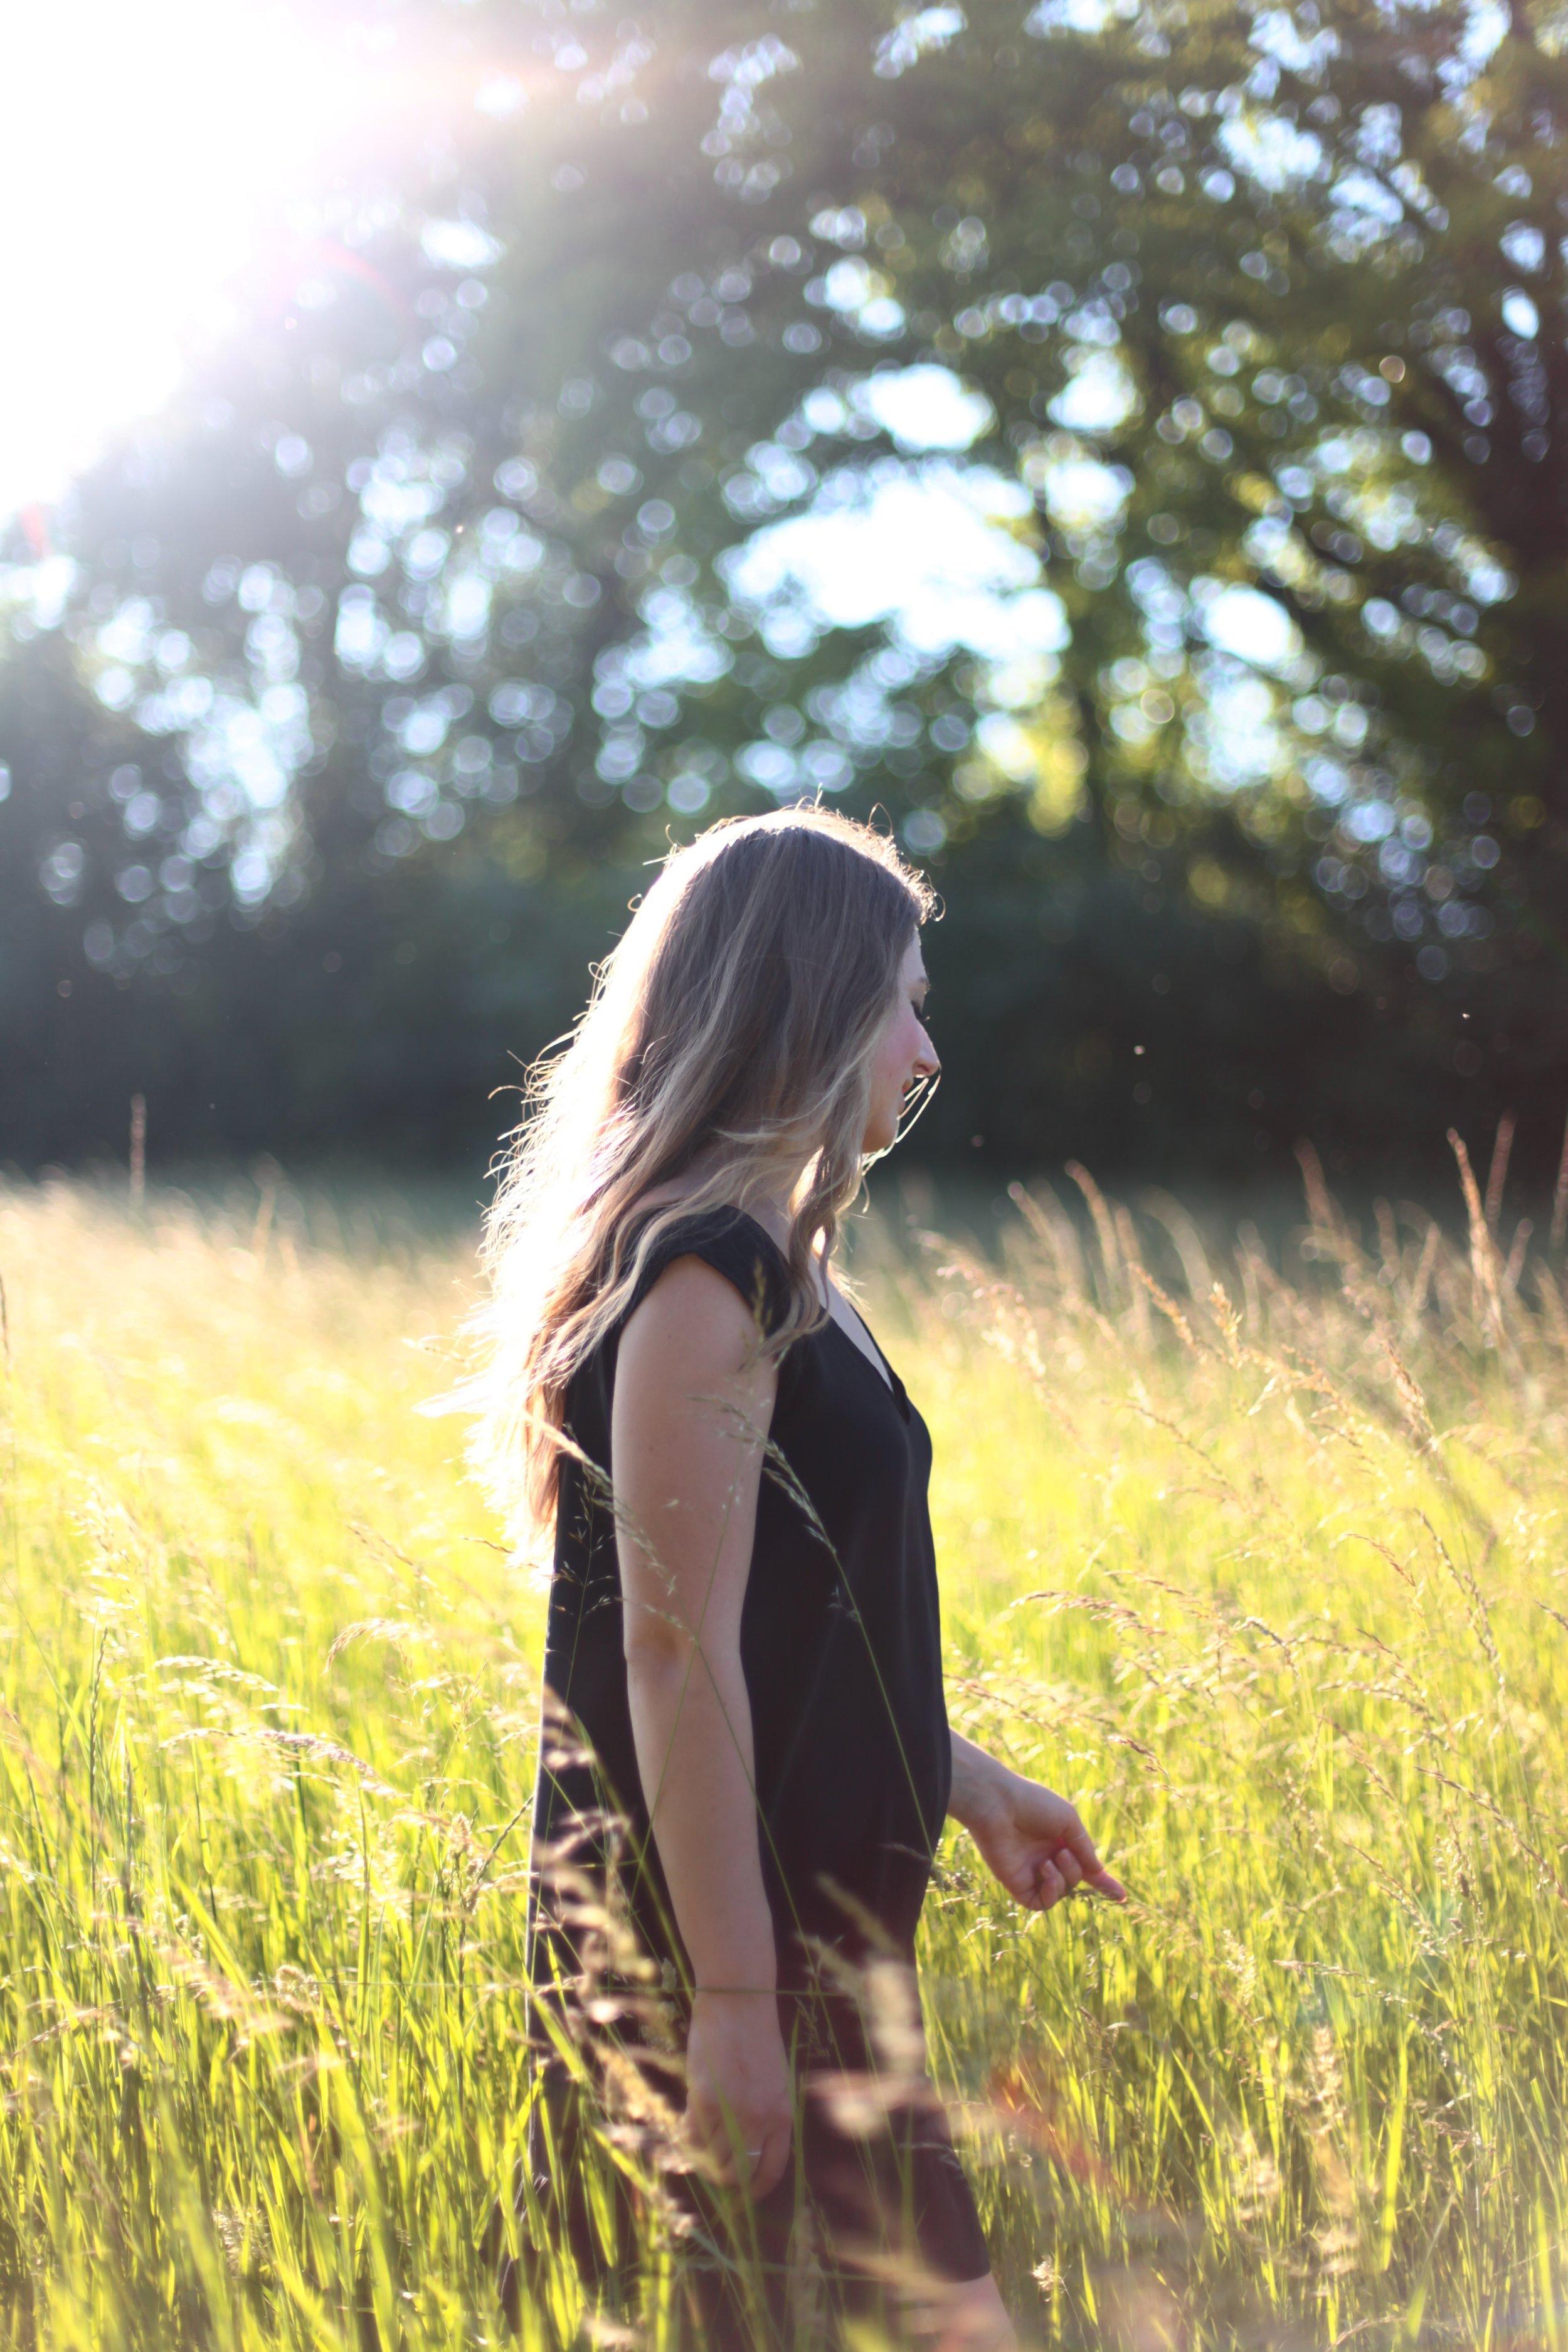 release-self-doubt-overcome-self-consciousness-intuitive-life-coach-dubai-sarah-lewis